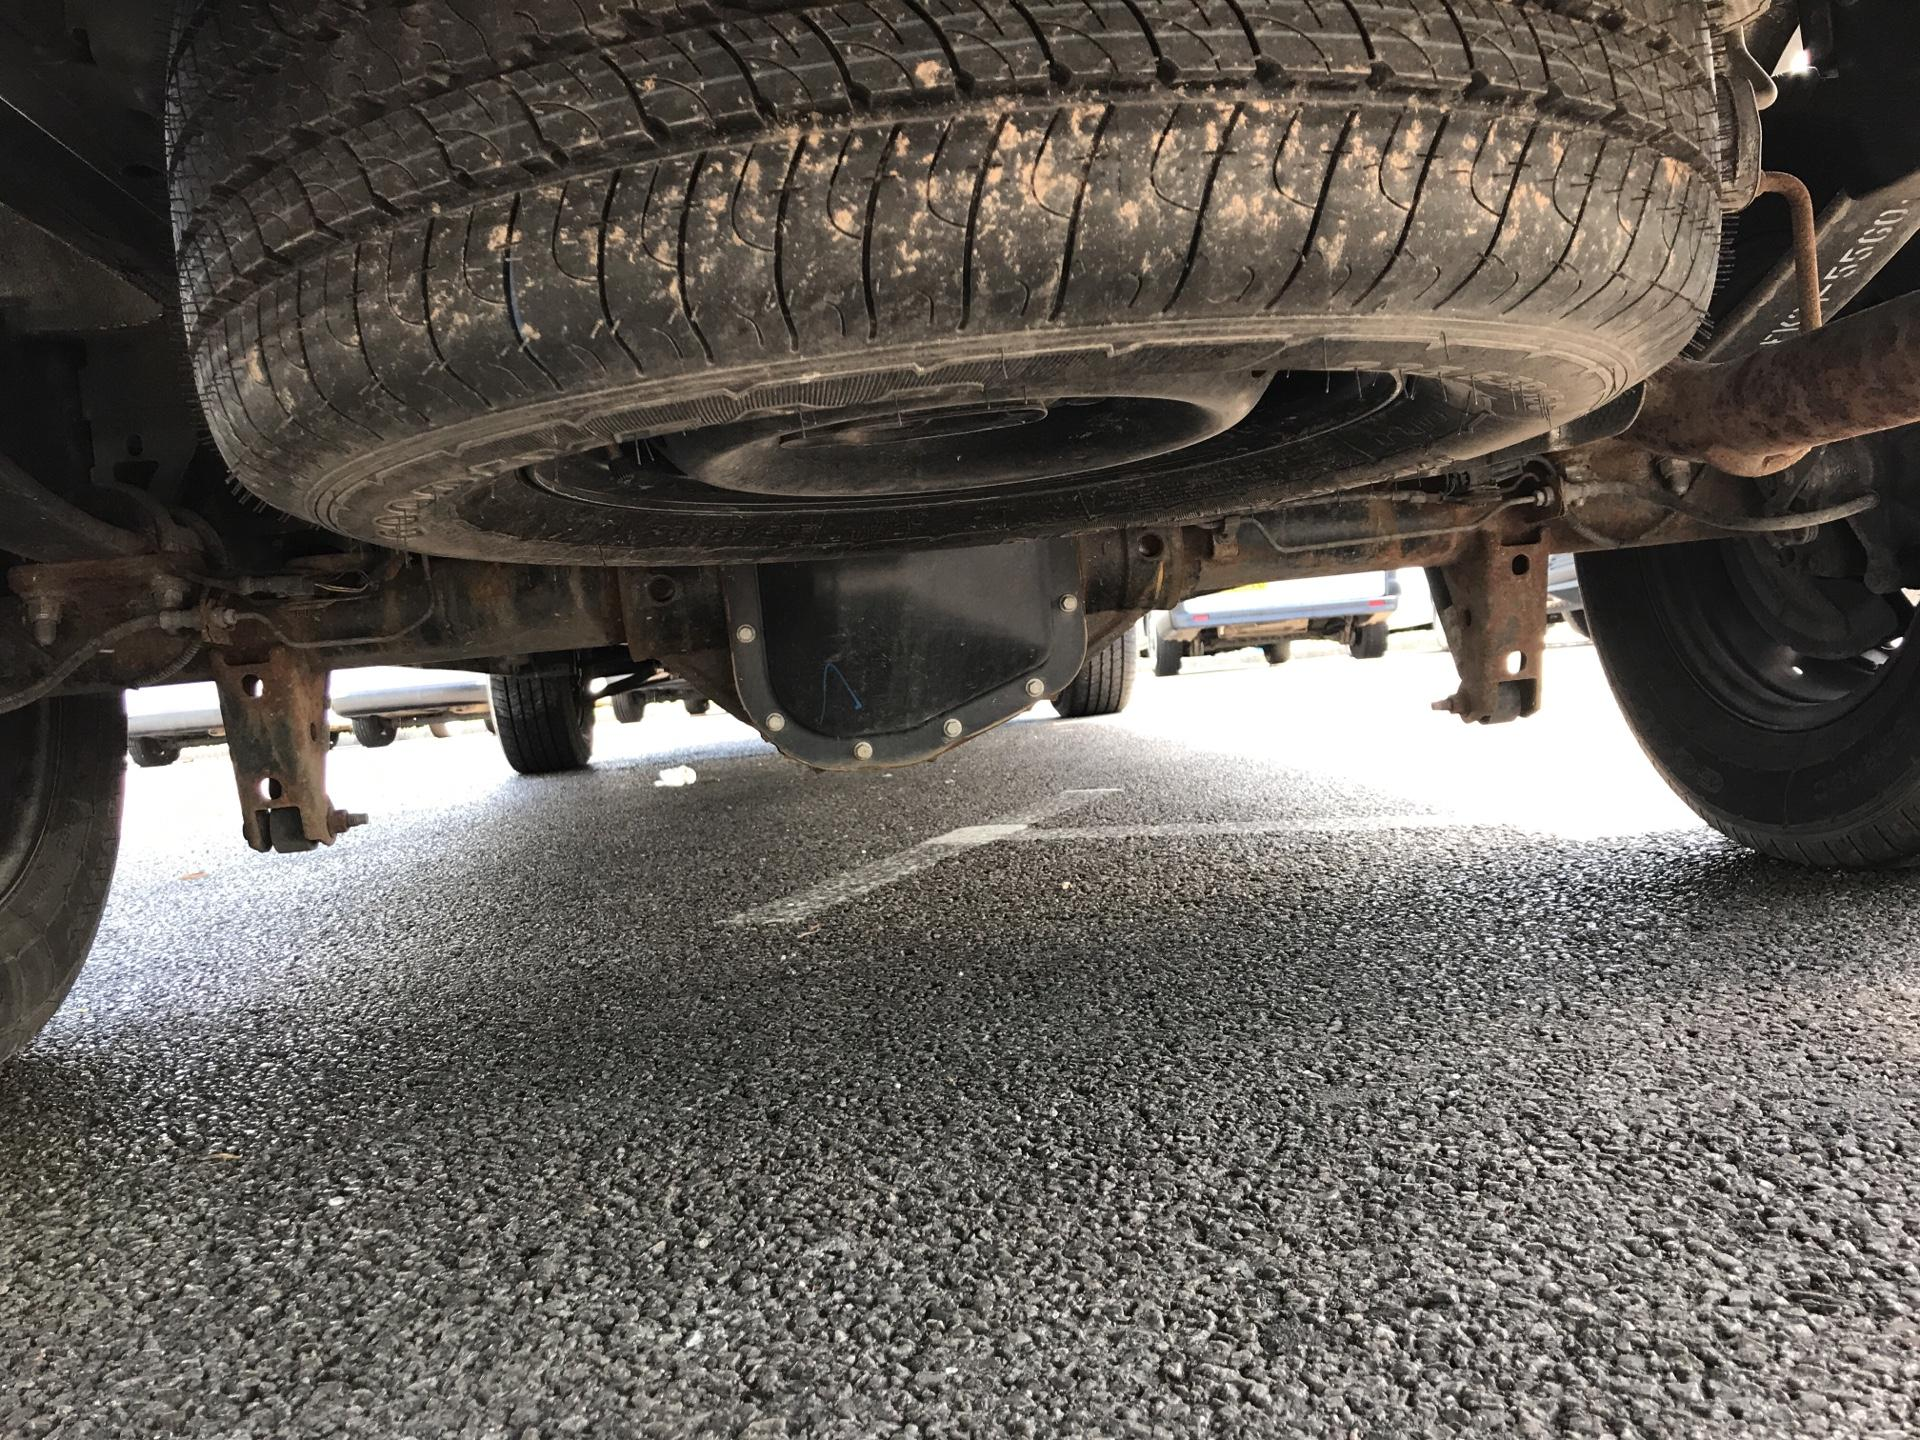 2018 Ford Transit 2.0 Tdci 130Ps H2 D/Cab Crew Van Euro 6 (WU68PXA) Image 26